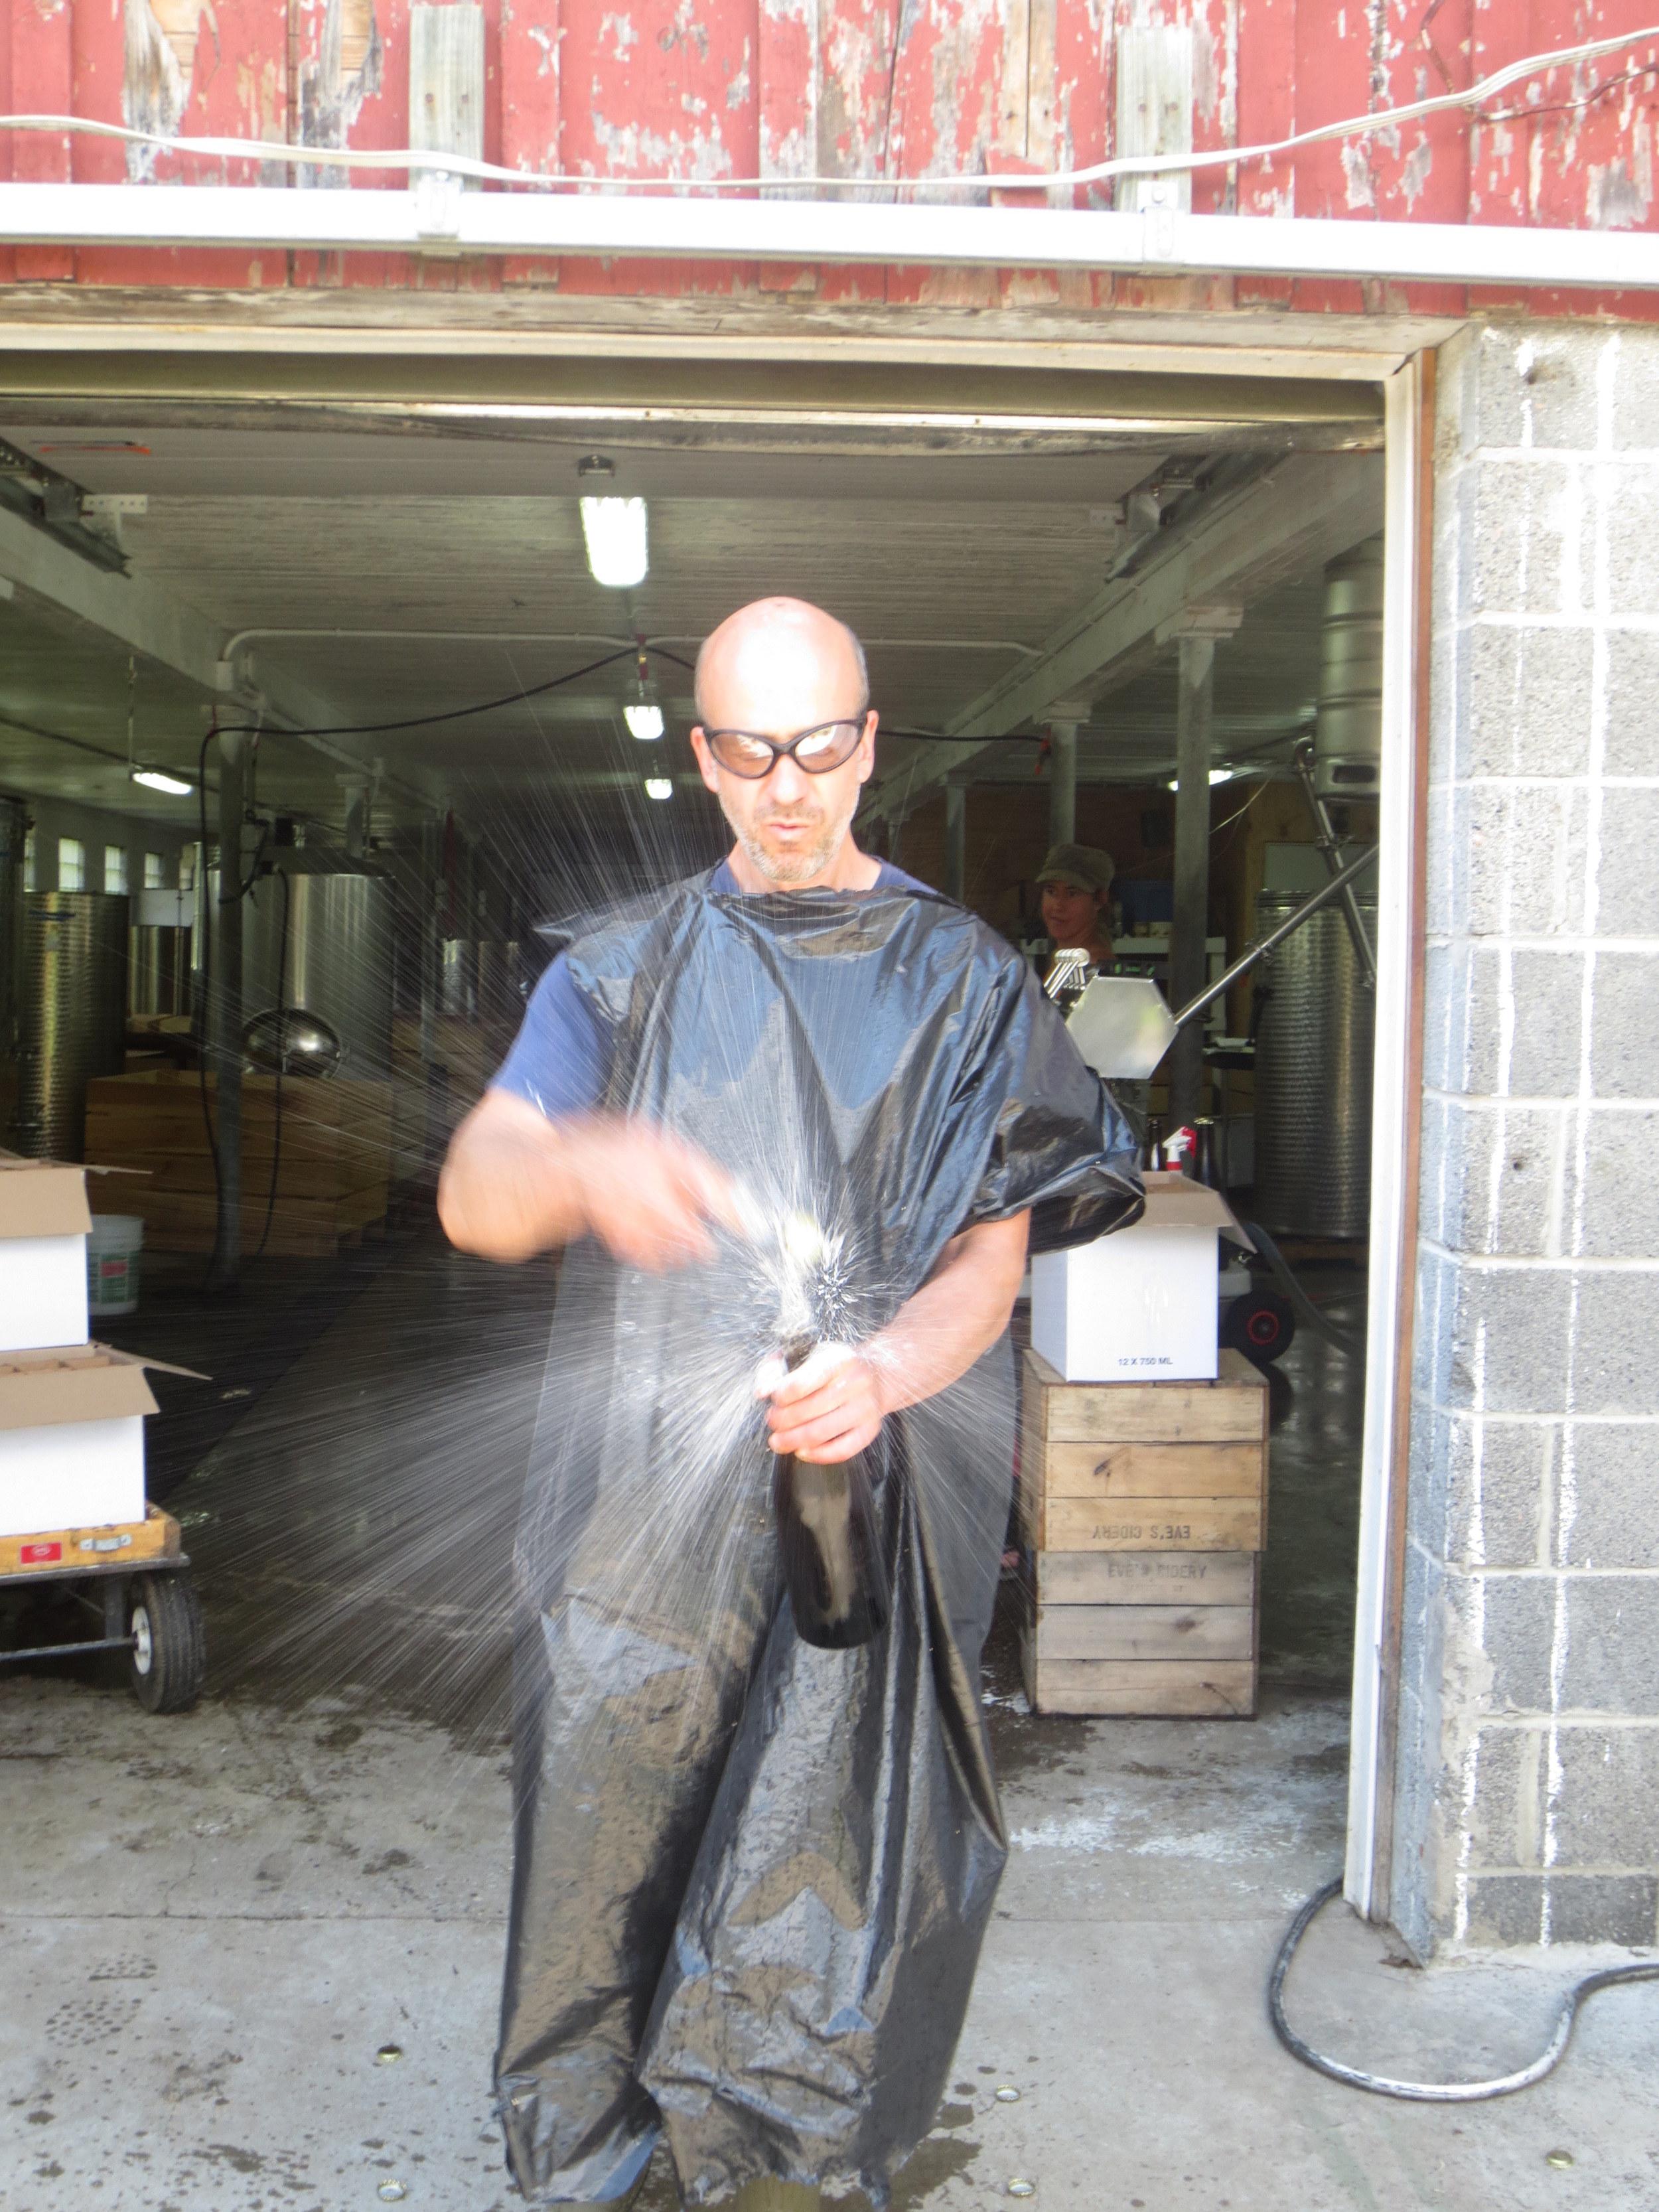 Ezra in summer gear, disgorging Eve's signature champagne method cider